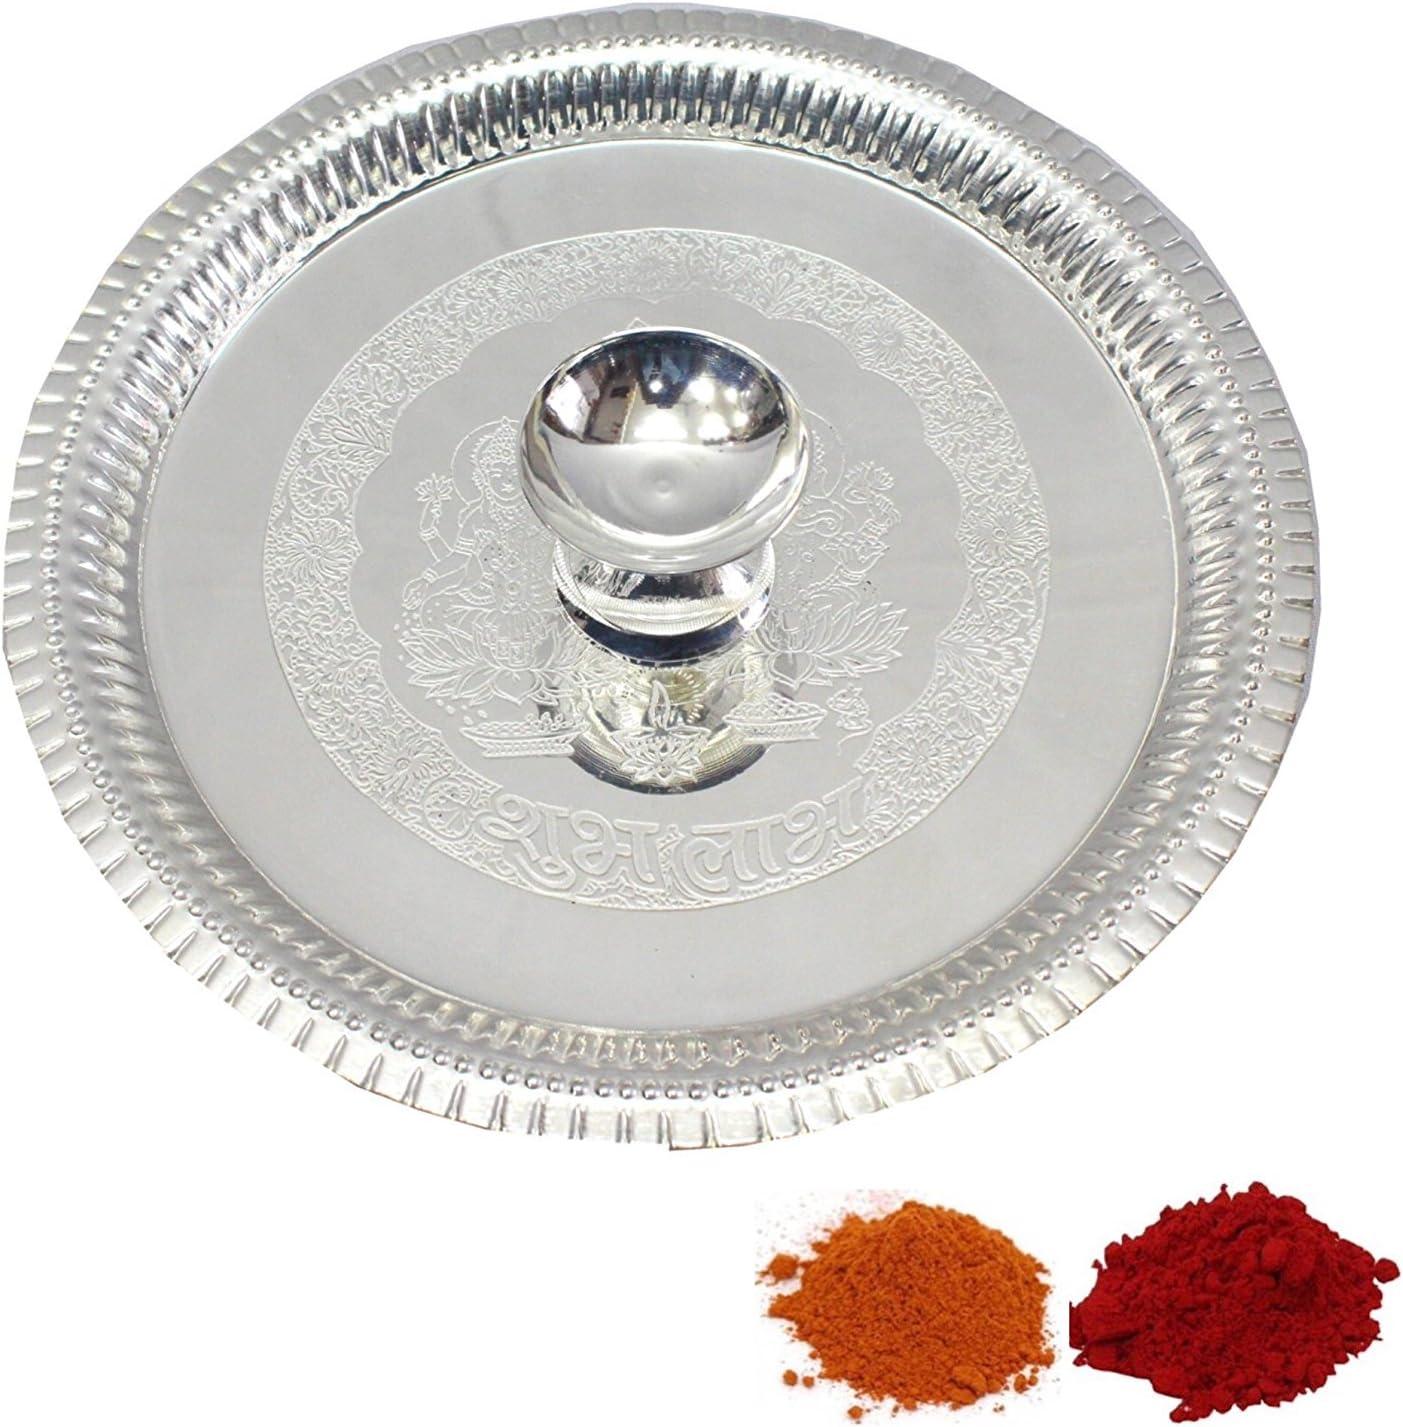 Indian Traditional Decorative Pooja thali Beautiful Lakshmi Festival Ethnic Gift for her/Kankavati/Diwali/Indian Handicraft/Home/Temple/Office/Wedding Gift/Bulk Gift. GS10